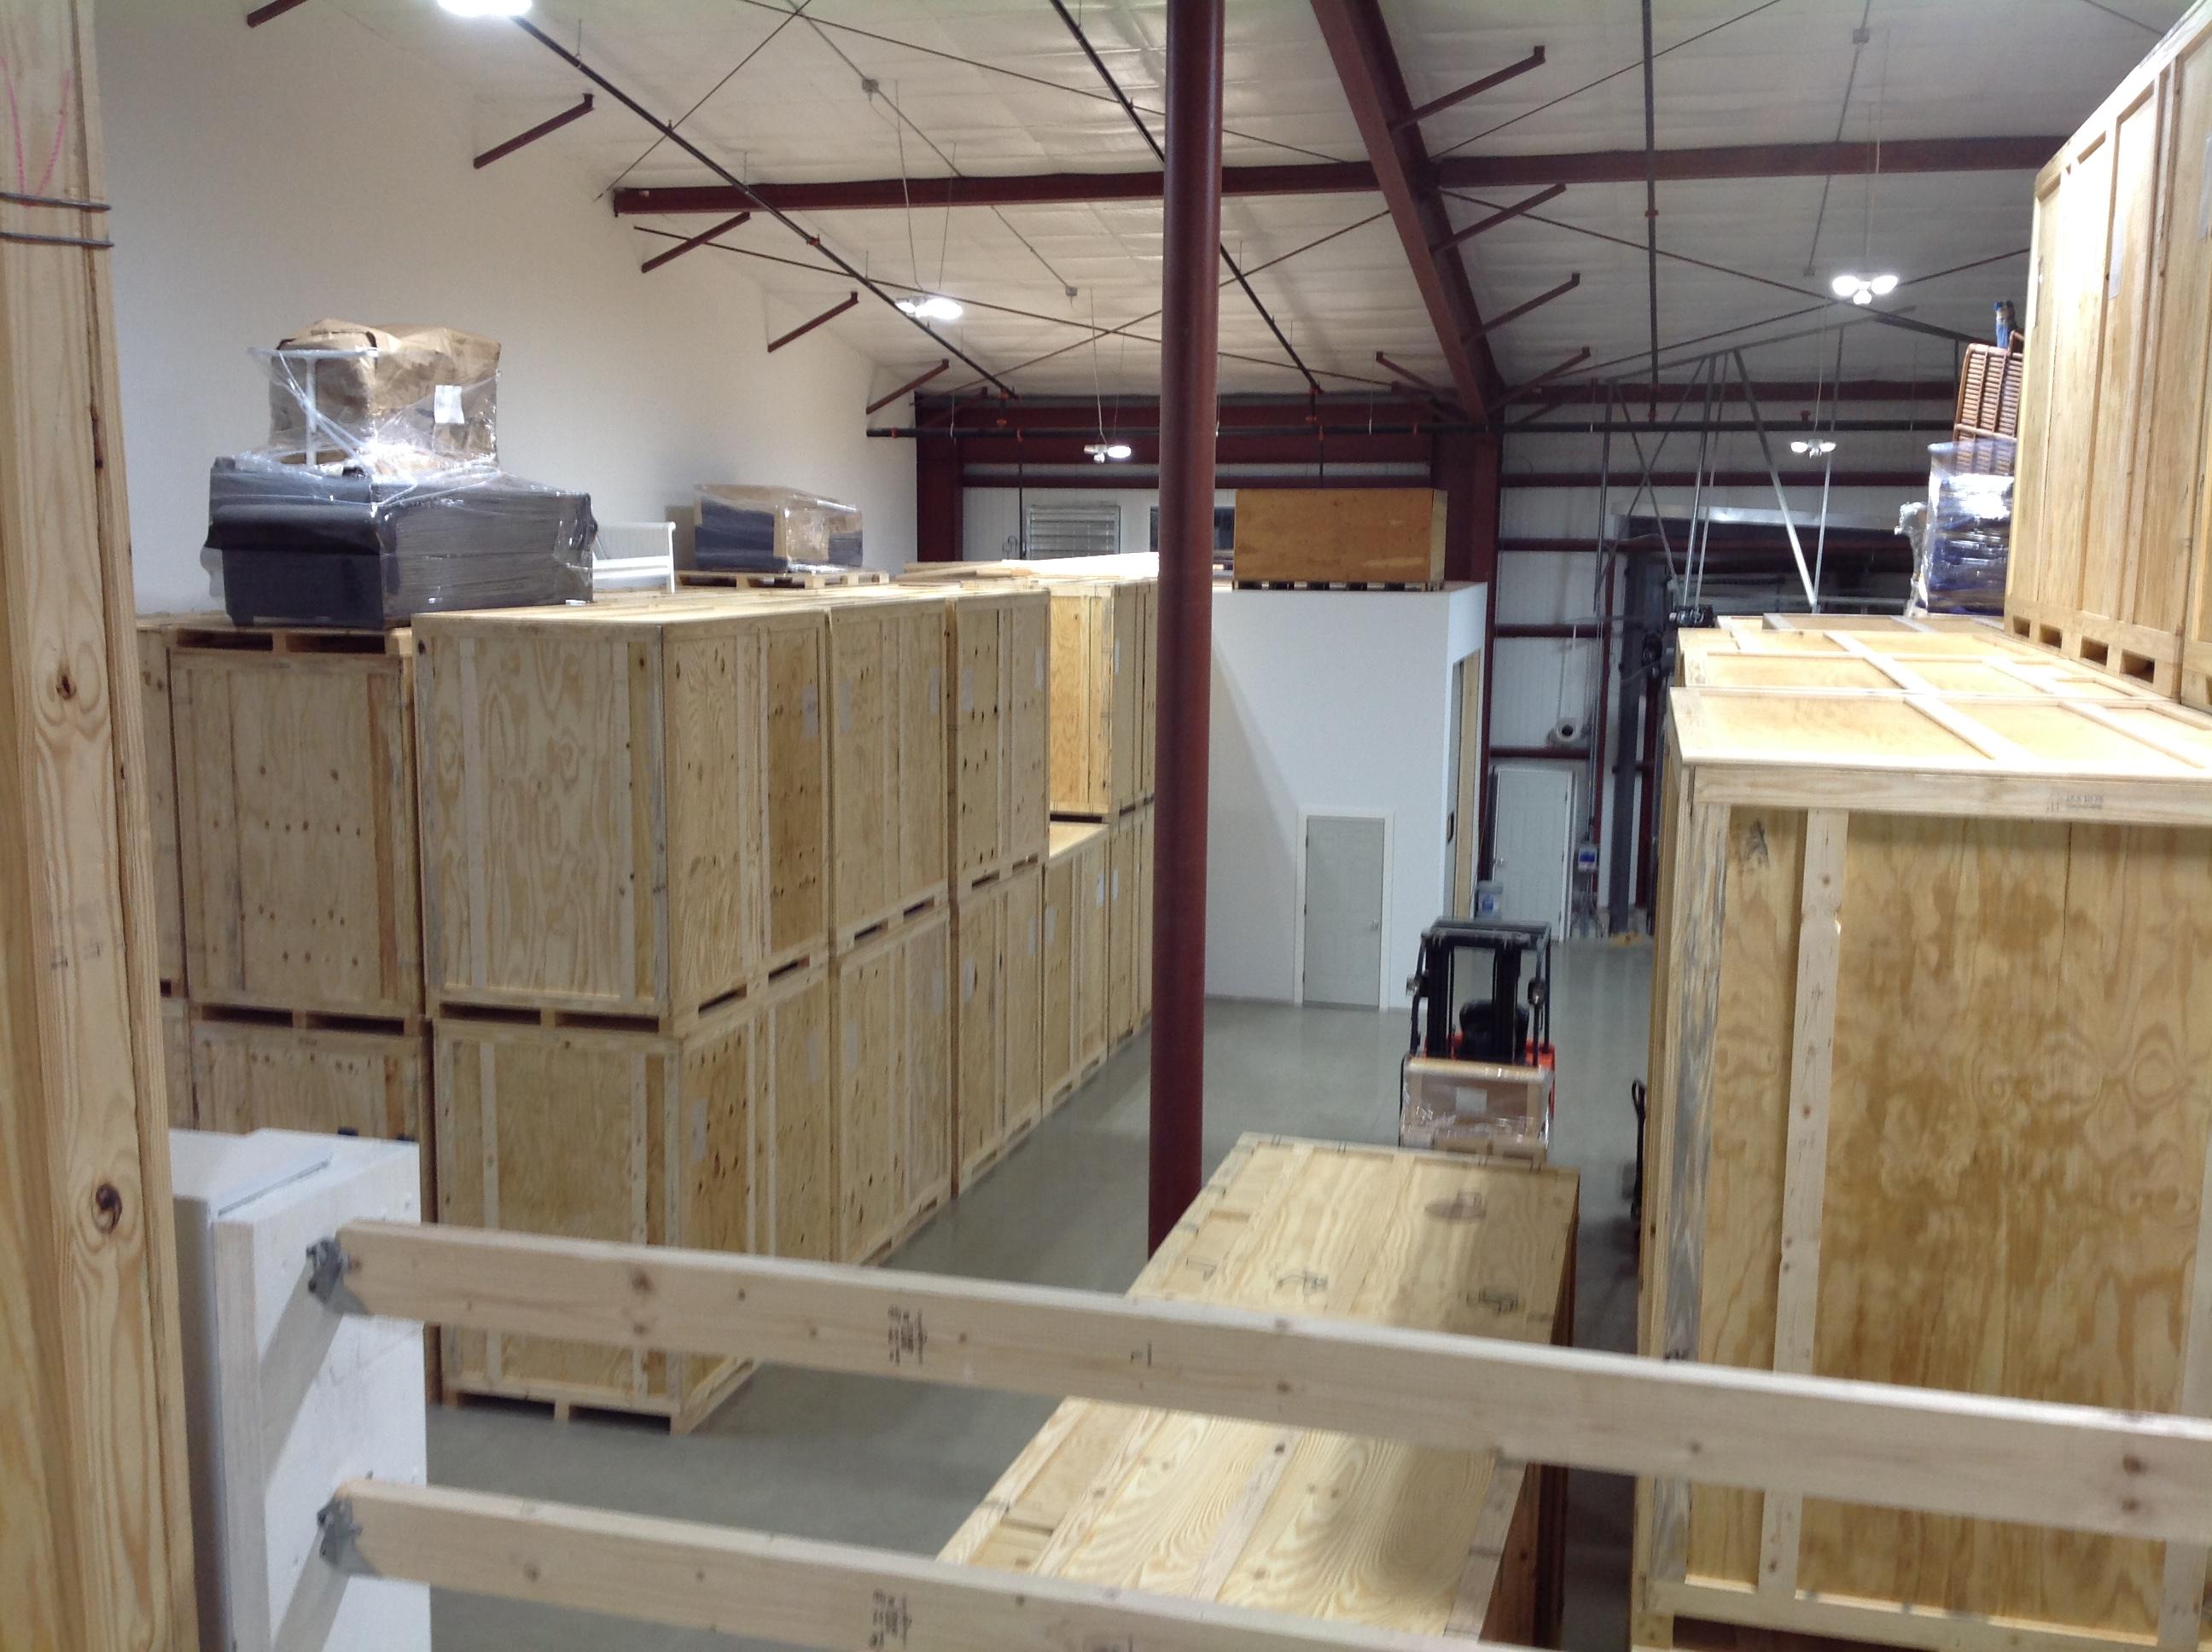 Insurcomm Storage Division, Insurcomm Content Restoration